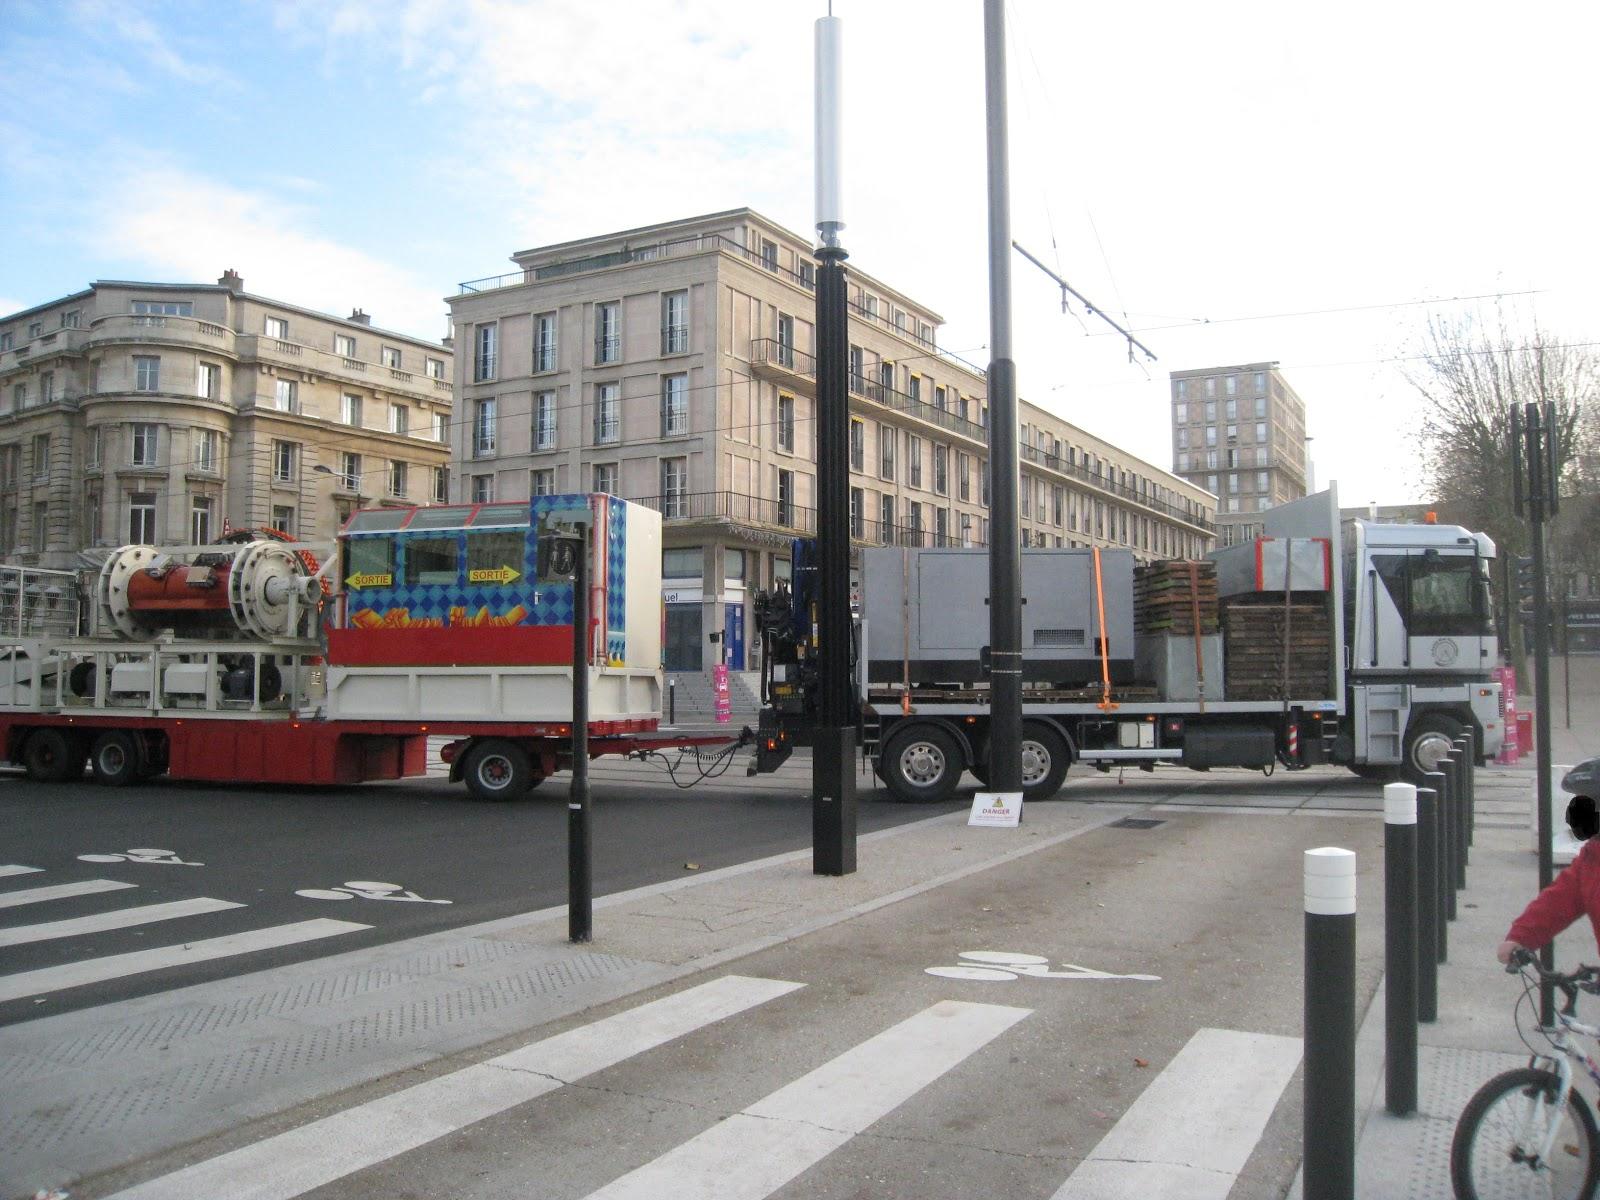 12/12/12 12h12 - Inauguration du tramway Granderouelehavre